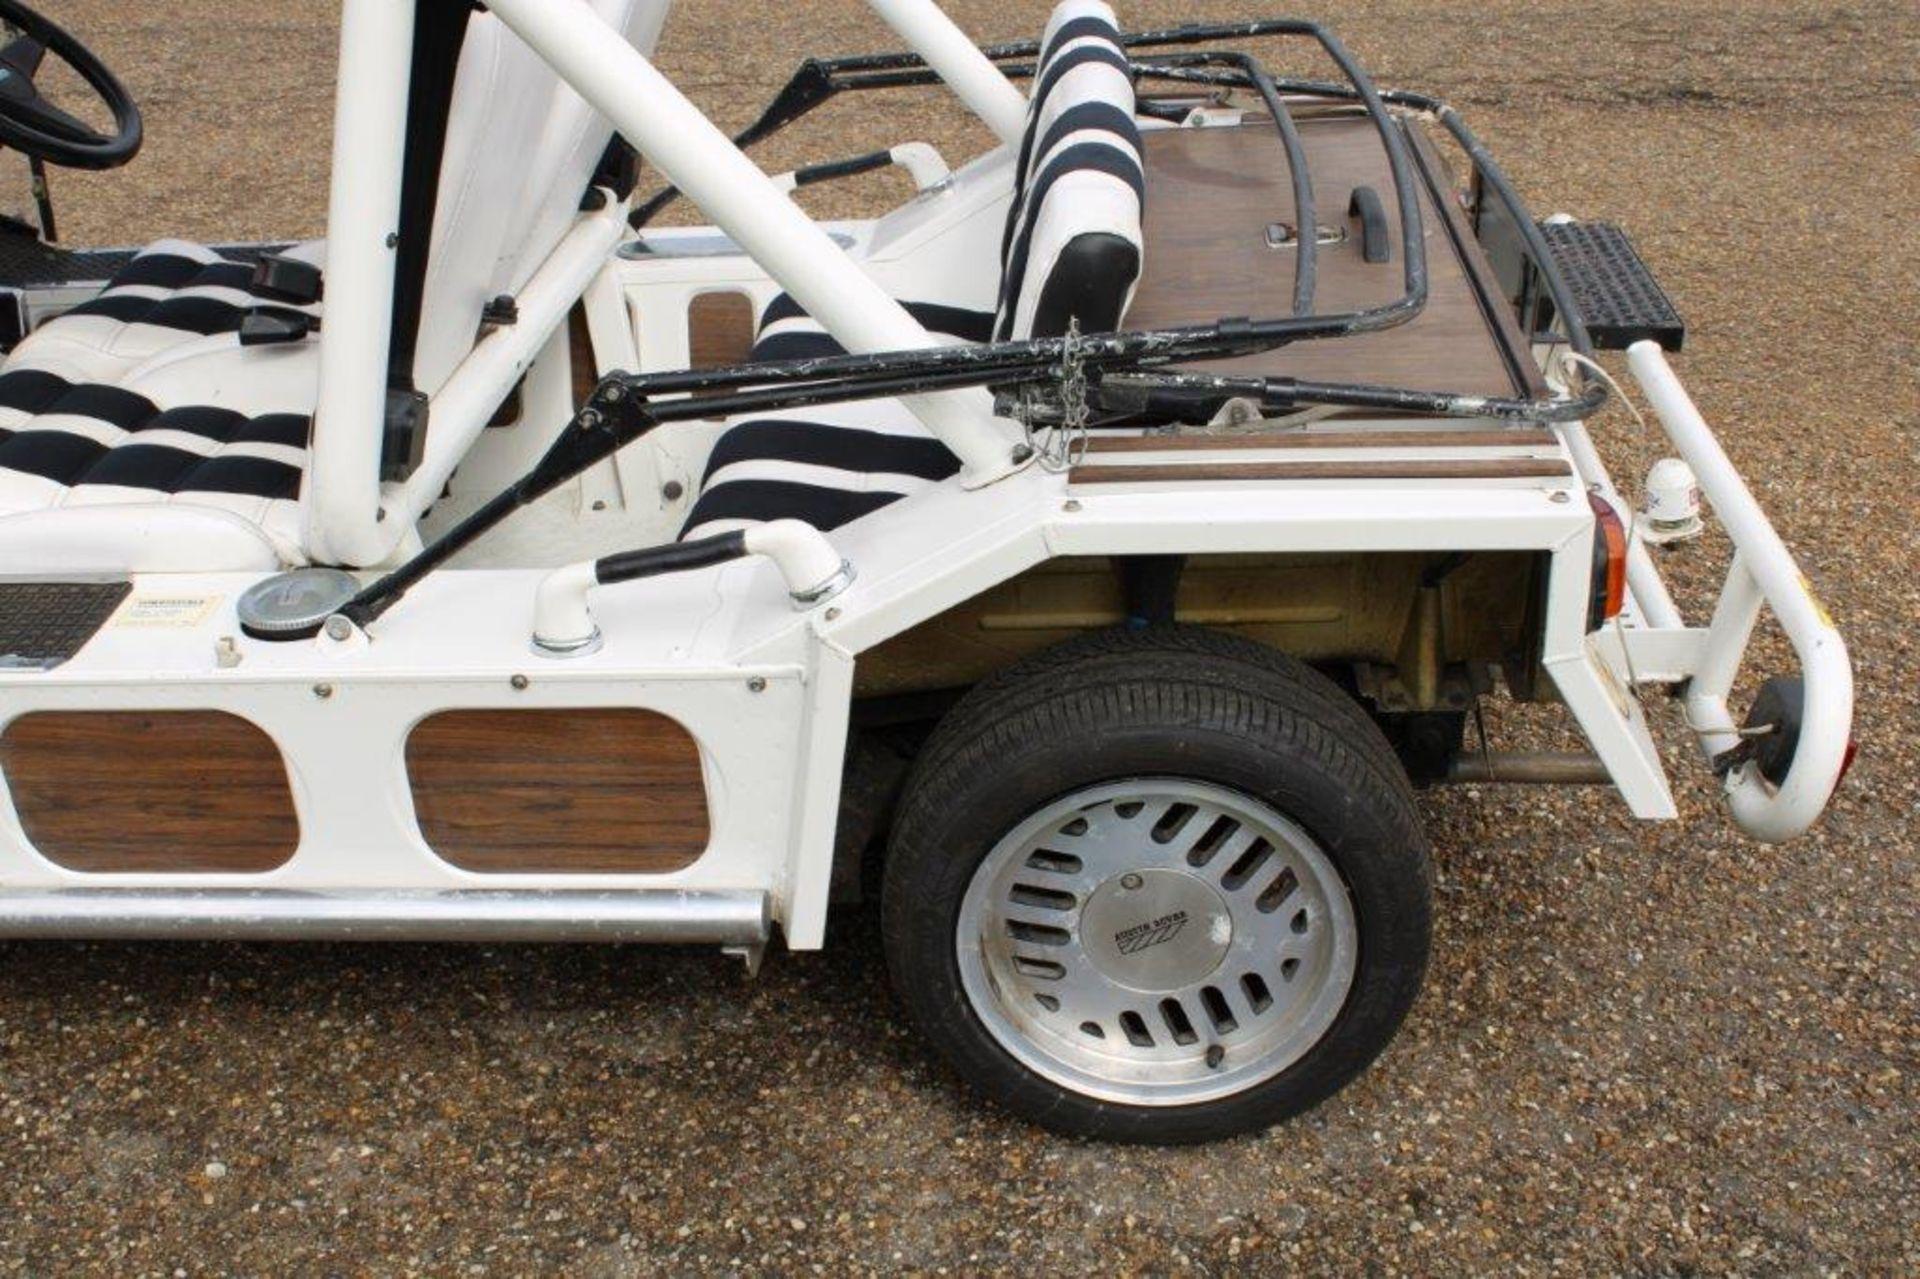 1988 Austin Rover Mini Moke - Image 9 of 22